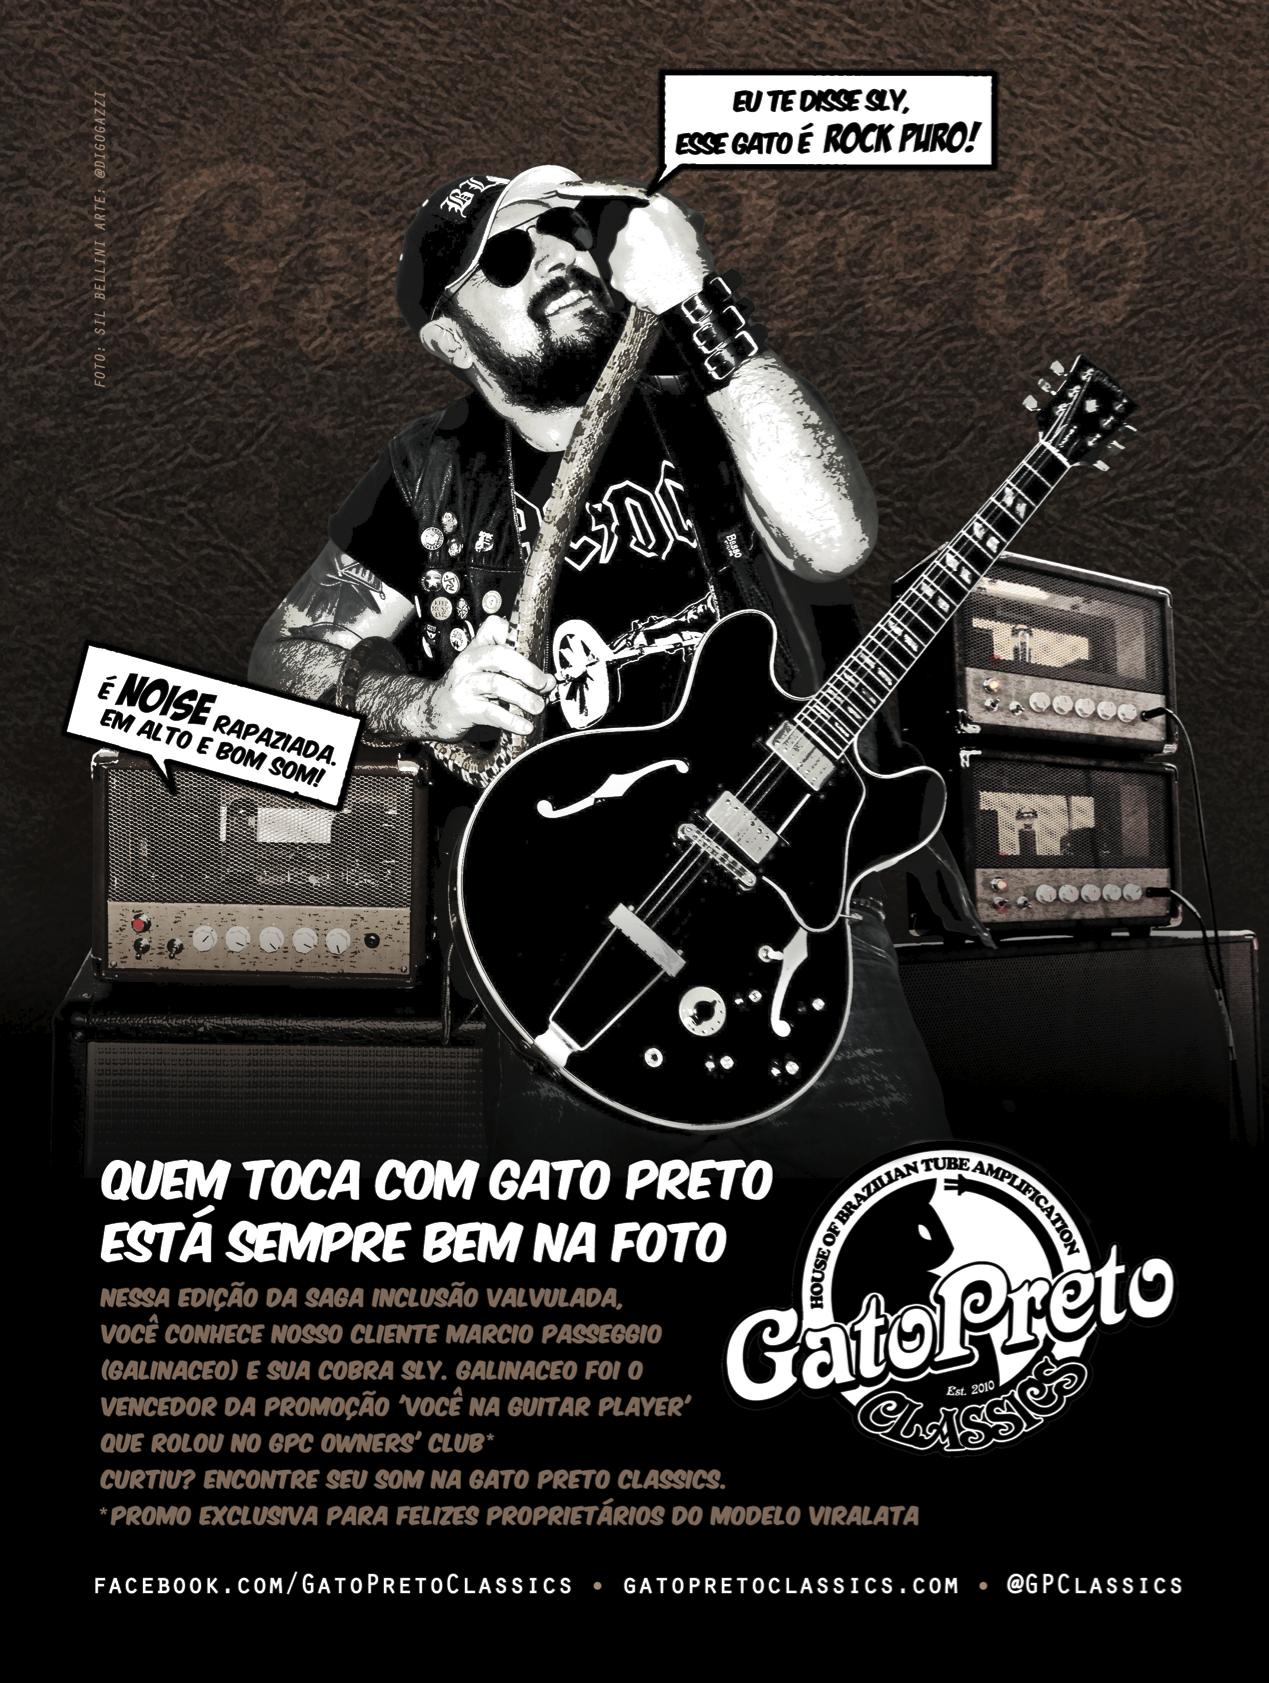 "Ad 5 - Guitar Player Magazine - Jul/13 -  Who: Marcio Passegio (Galinaceo) - GPC's Client - Campaign: ""Inclusão Valvulada"""